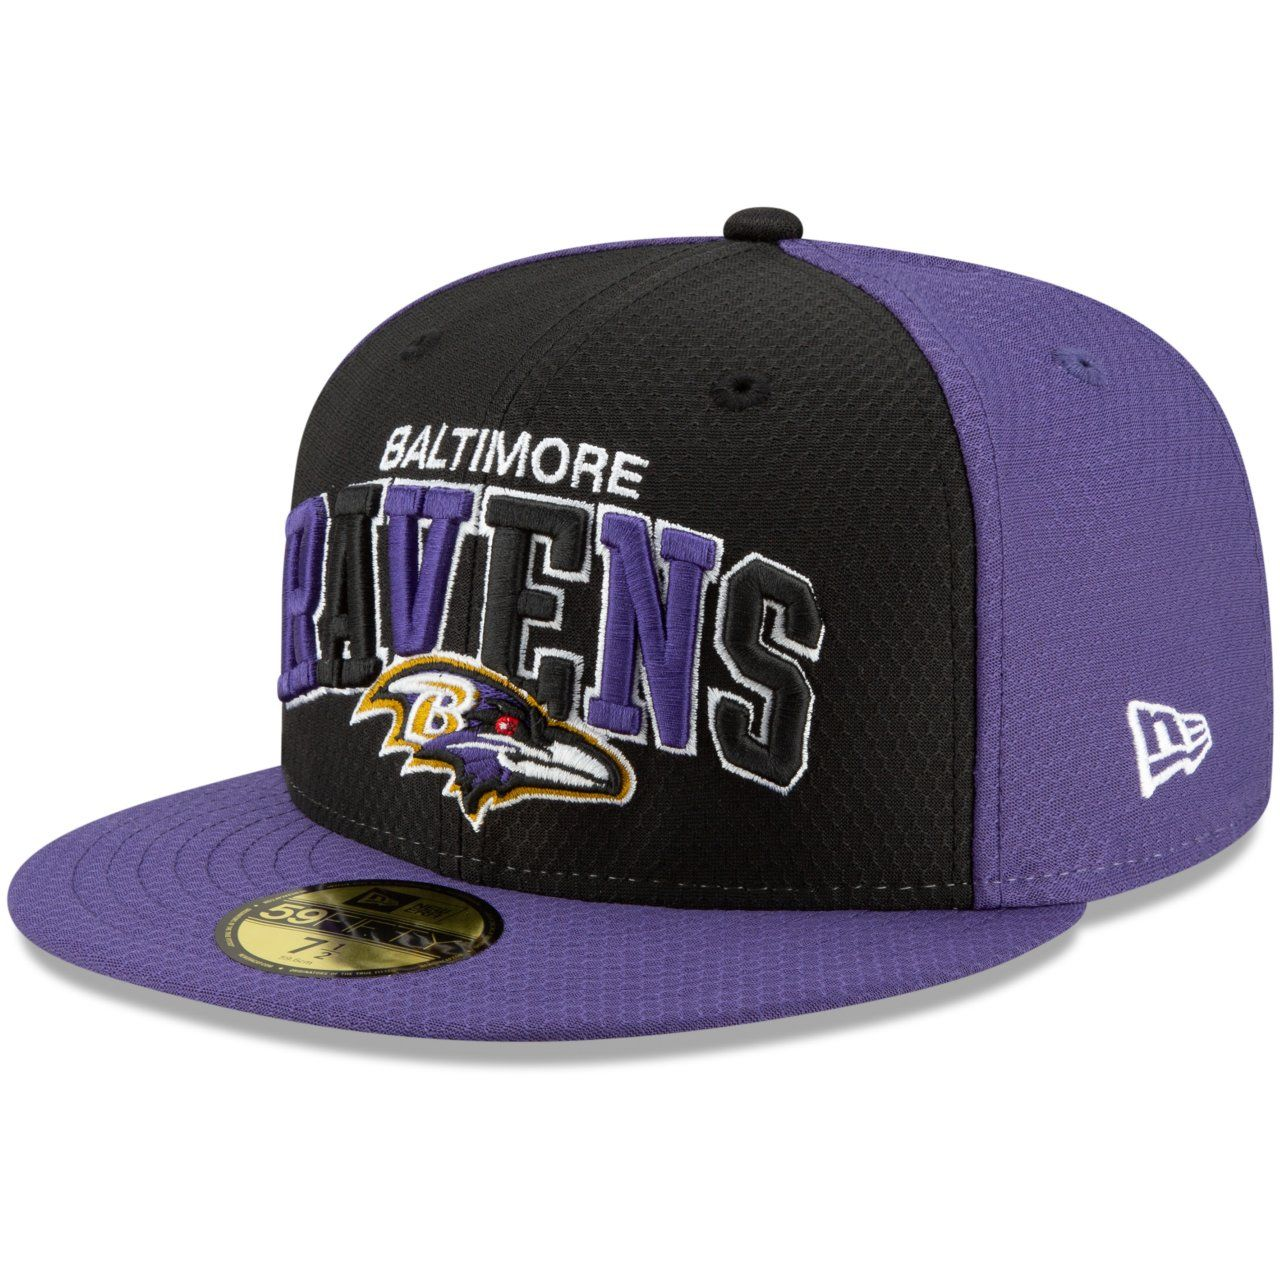 amfoo - New Era 59Fifty Cap - Sideline 90s Home Baltimore Ravens